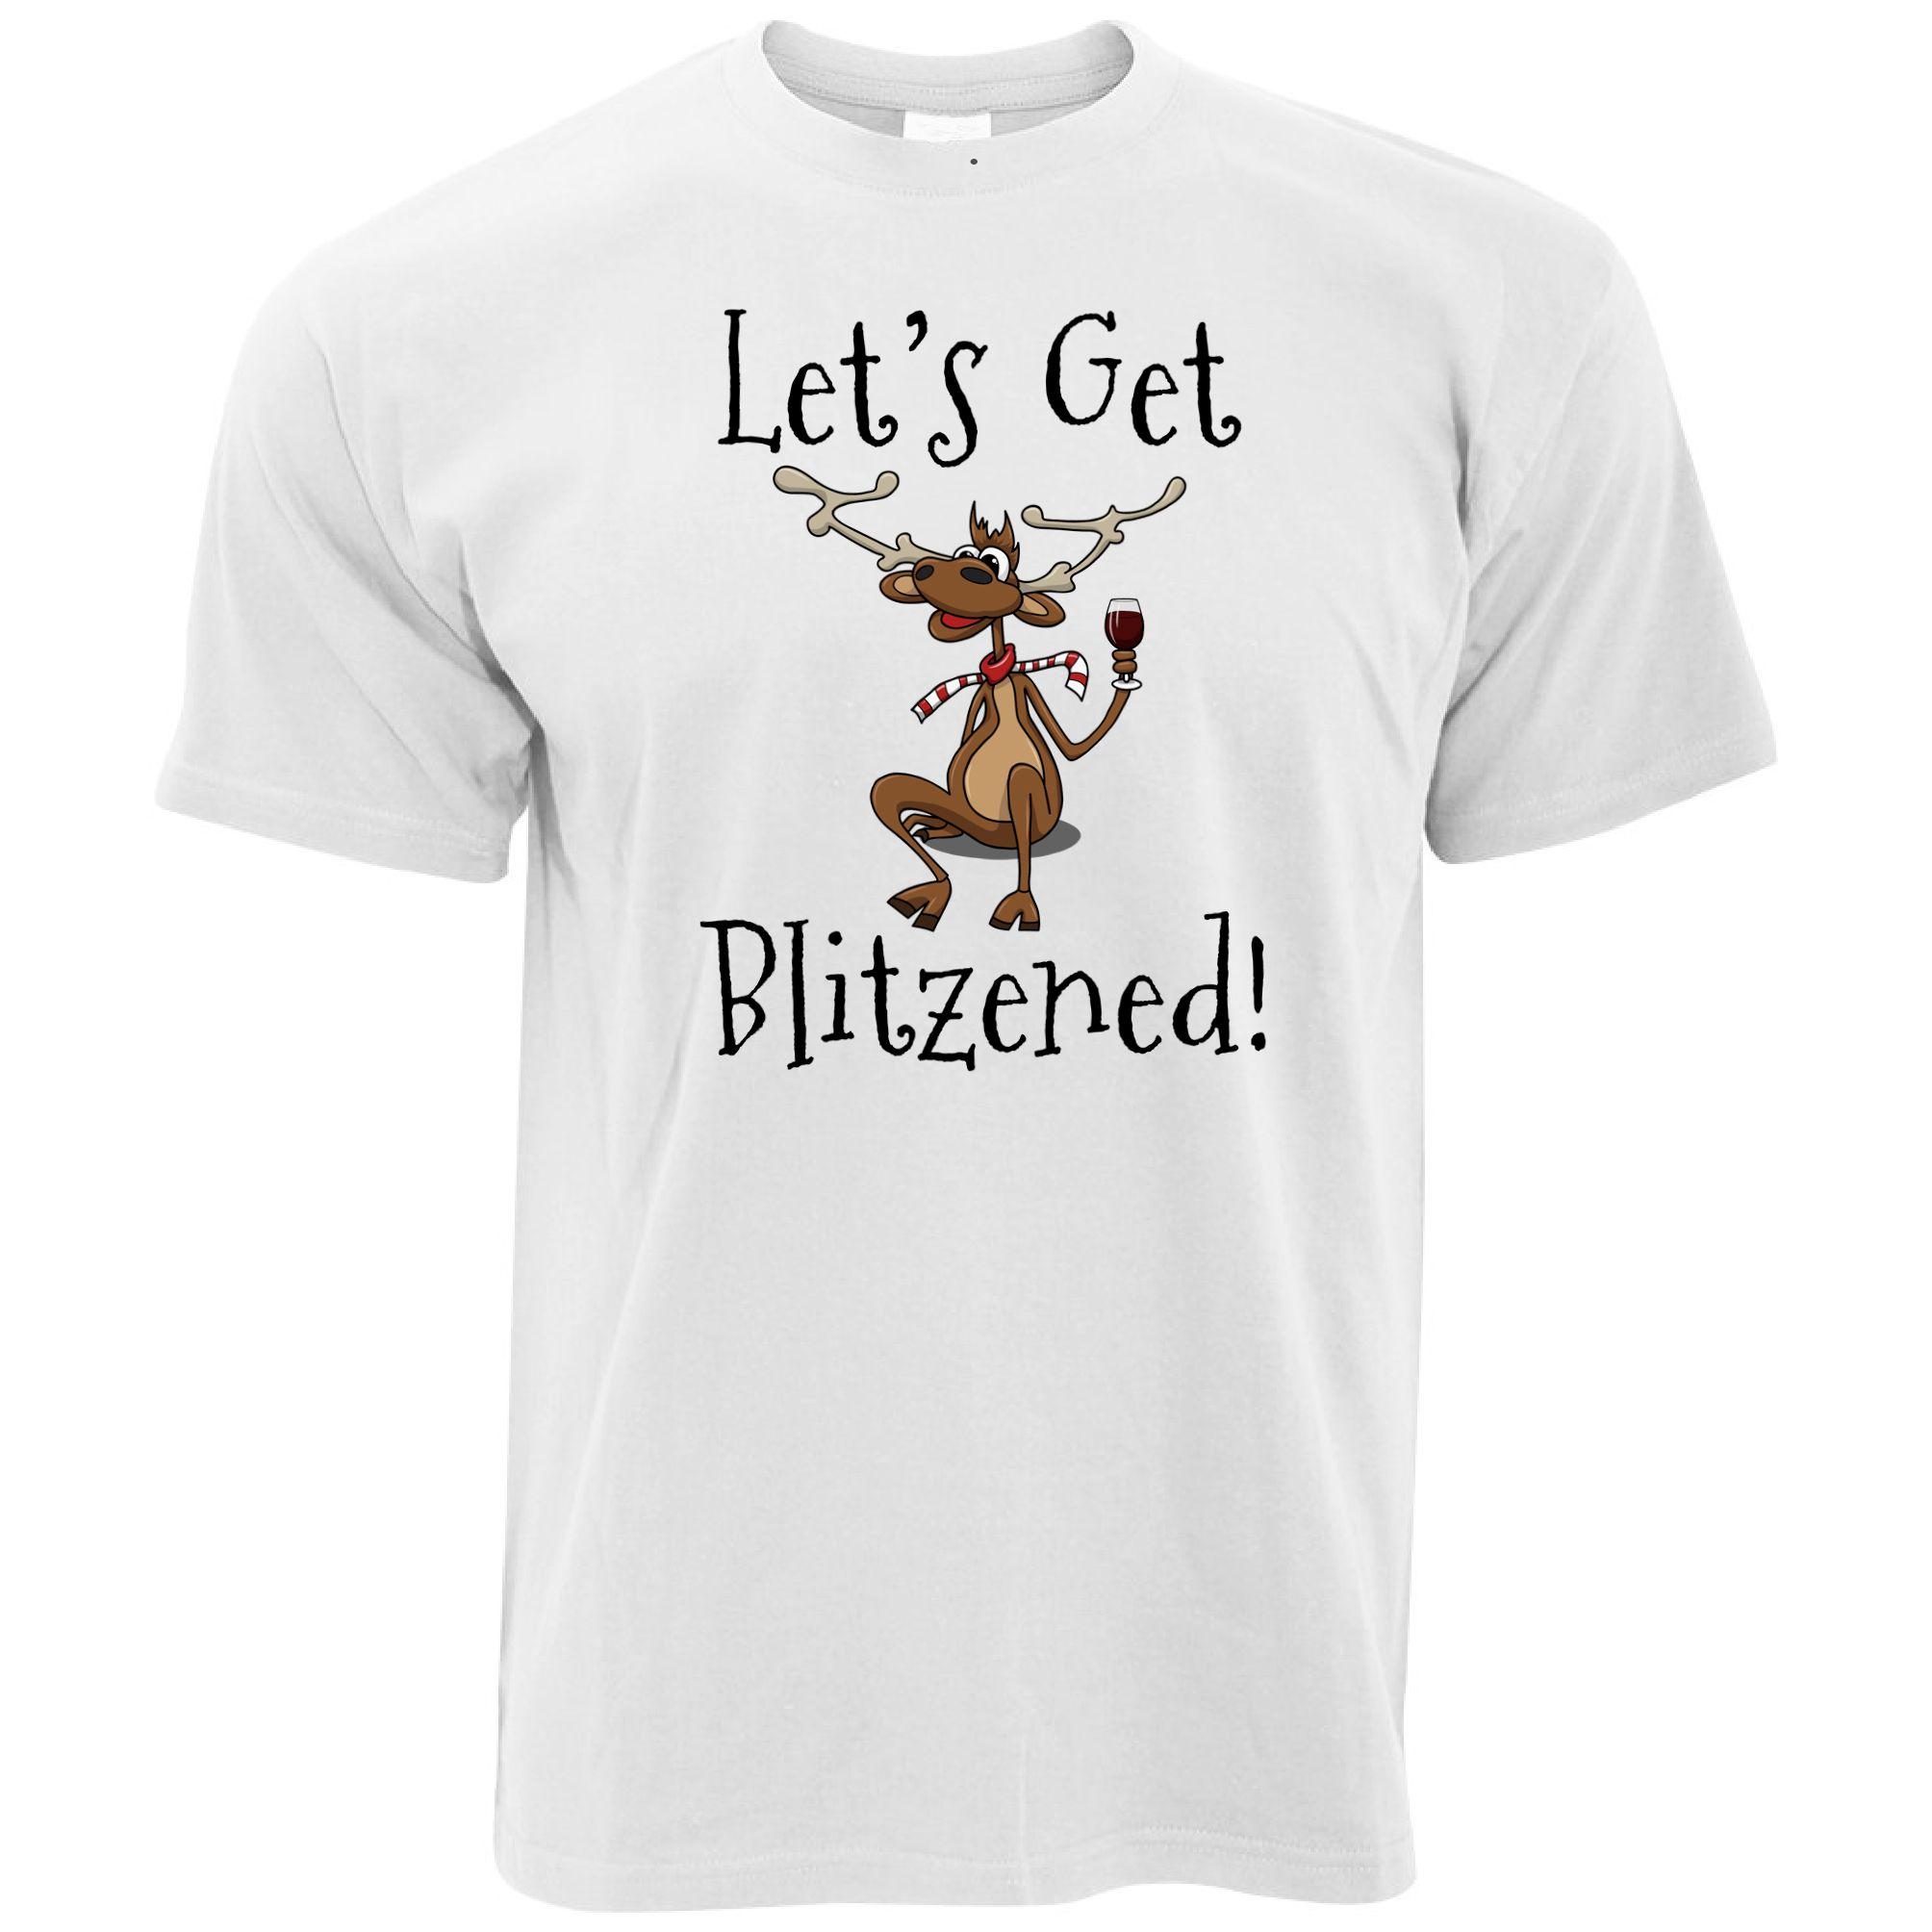 e2bf87fa549 Joke Christmas T Shirt Let S Get Blitzened Pun Slogan Drinking Xmas Funny  Funny Unisex Casual Tee Gift Designs For T Shirts Awesome T Shirt From  Tshirtsinc